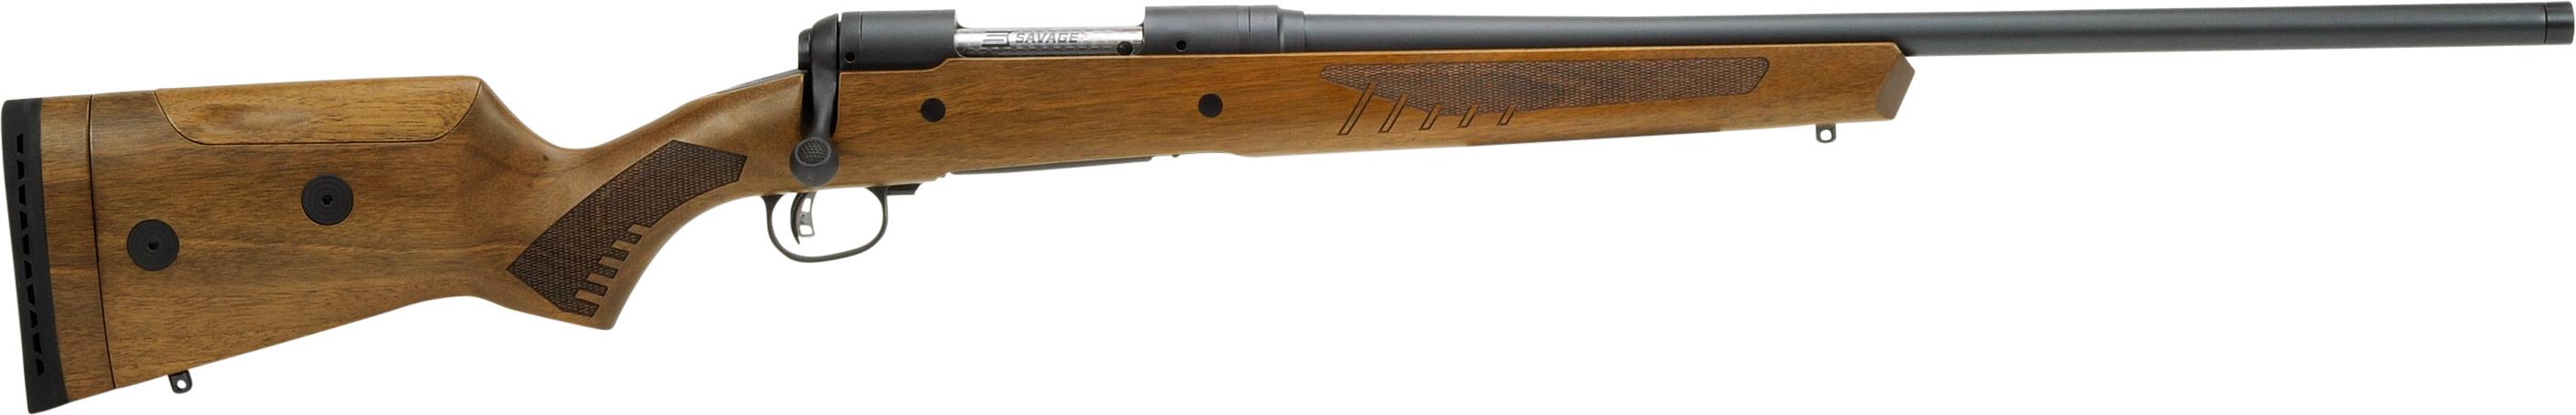 Savage Arms 110 Classic 30-06